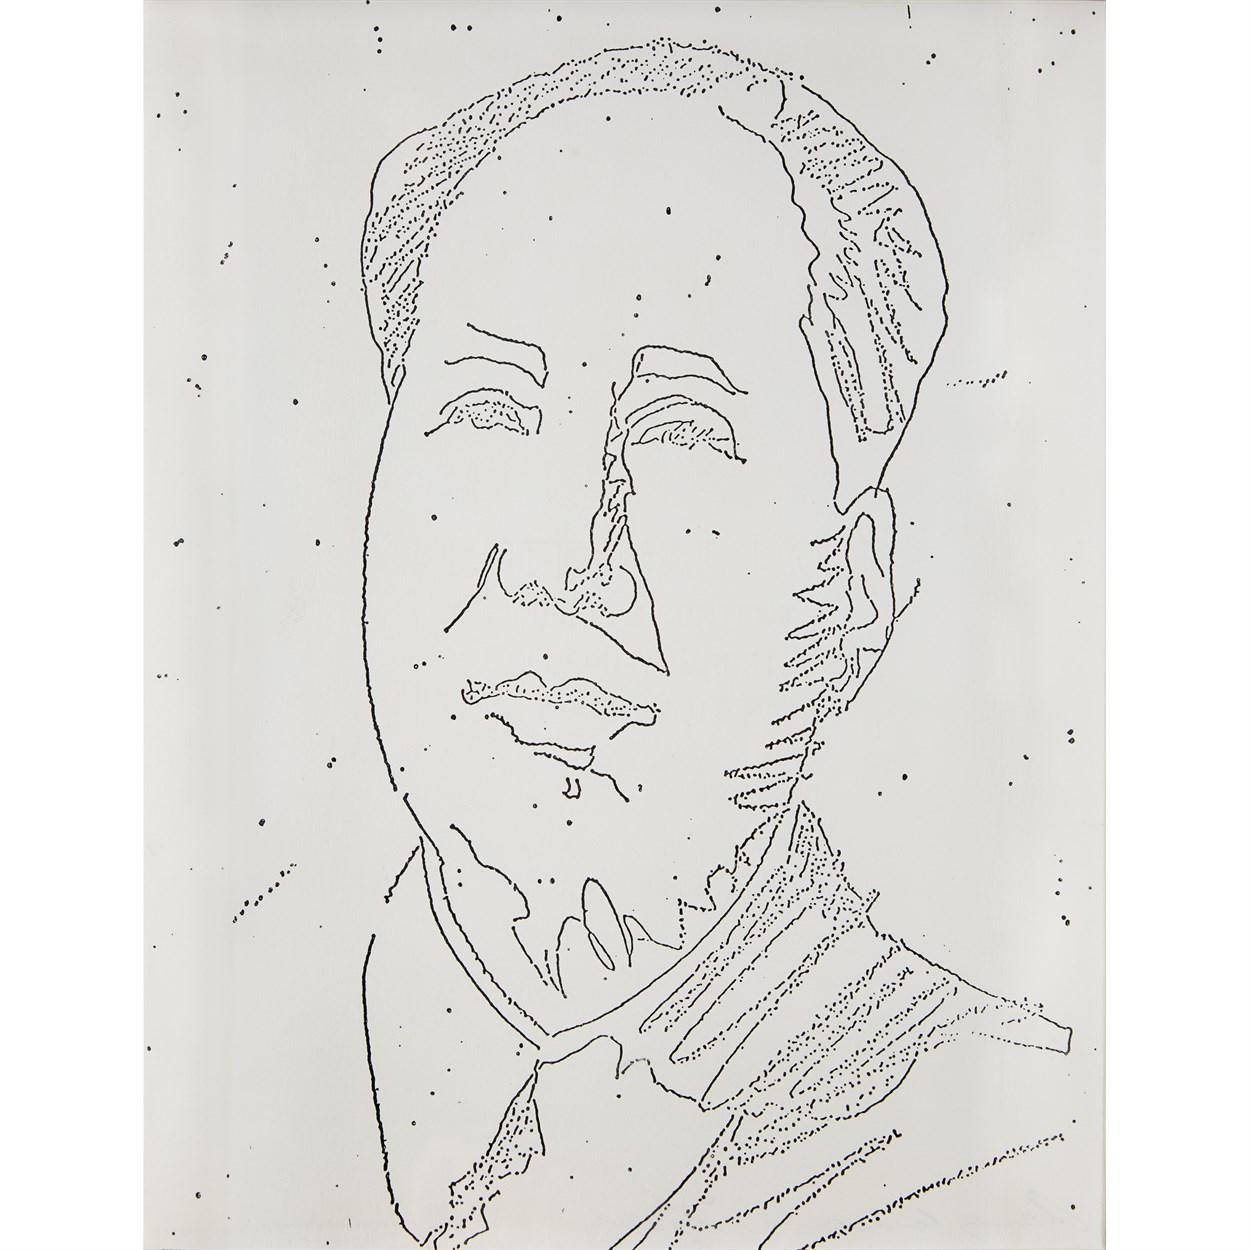 Lot 94 - Andy Warhol (American, 1928-1987)